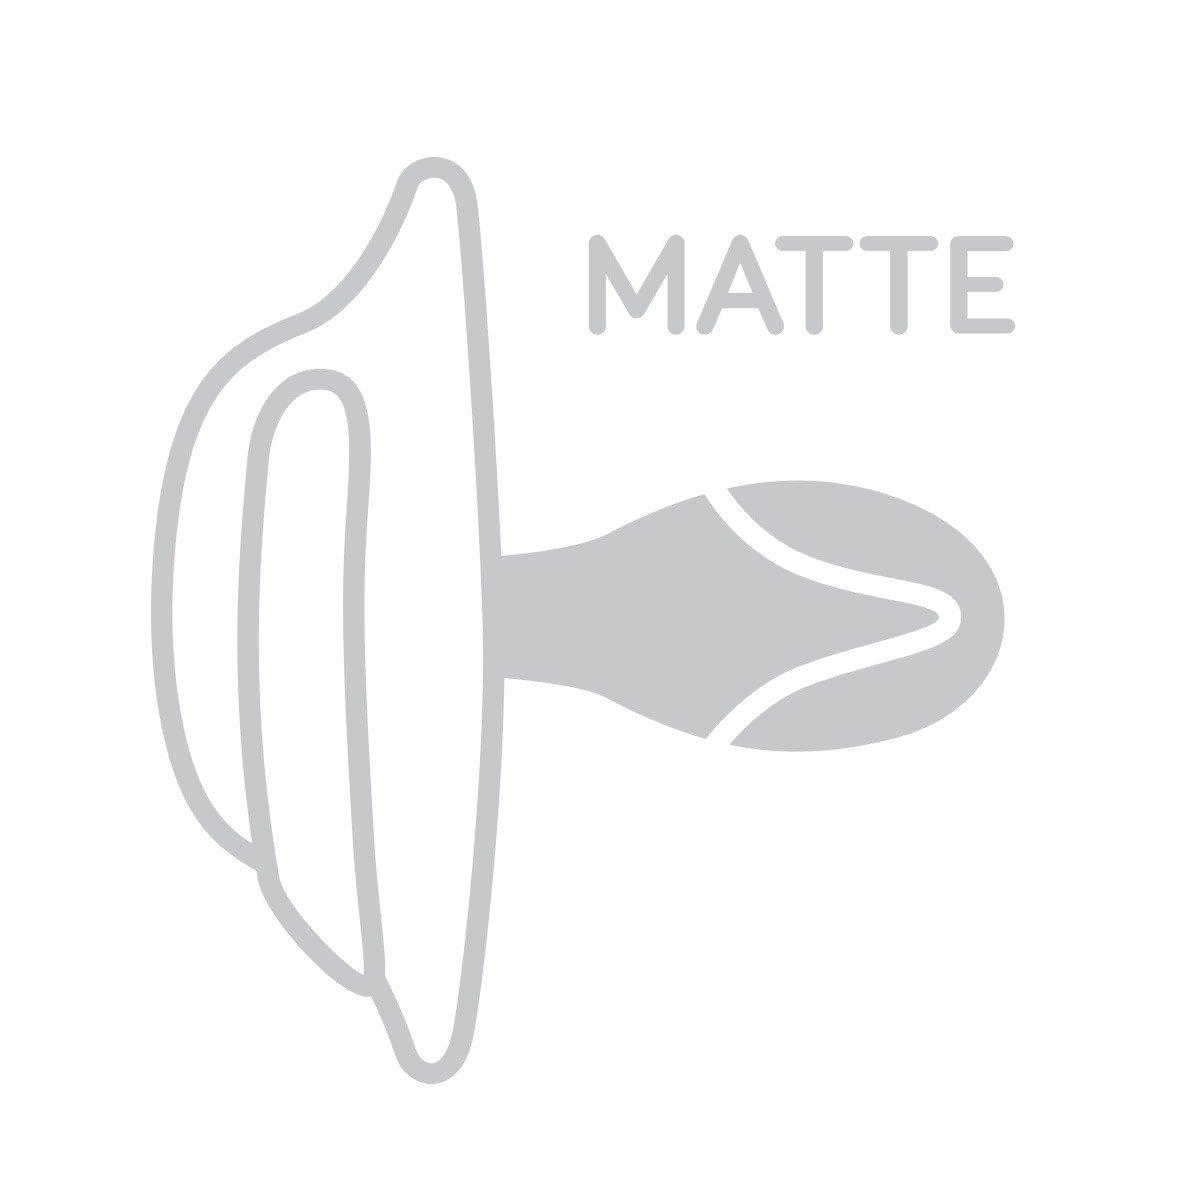 Dudlík symetrický silikonový 6-18m 2 ks - zvìtšit obrázek